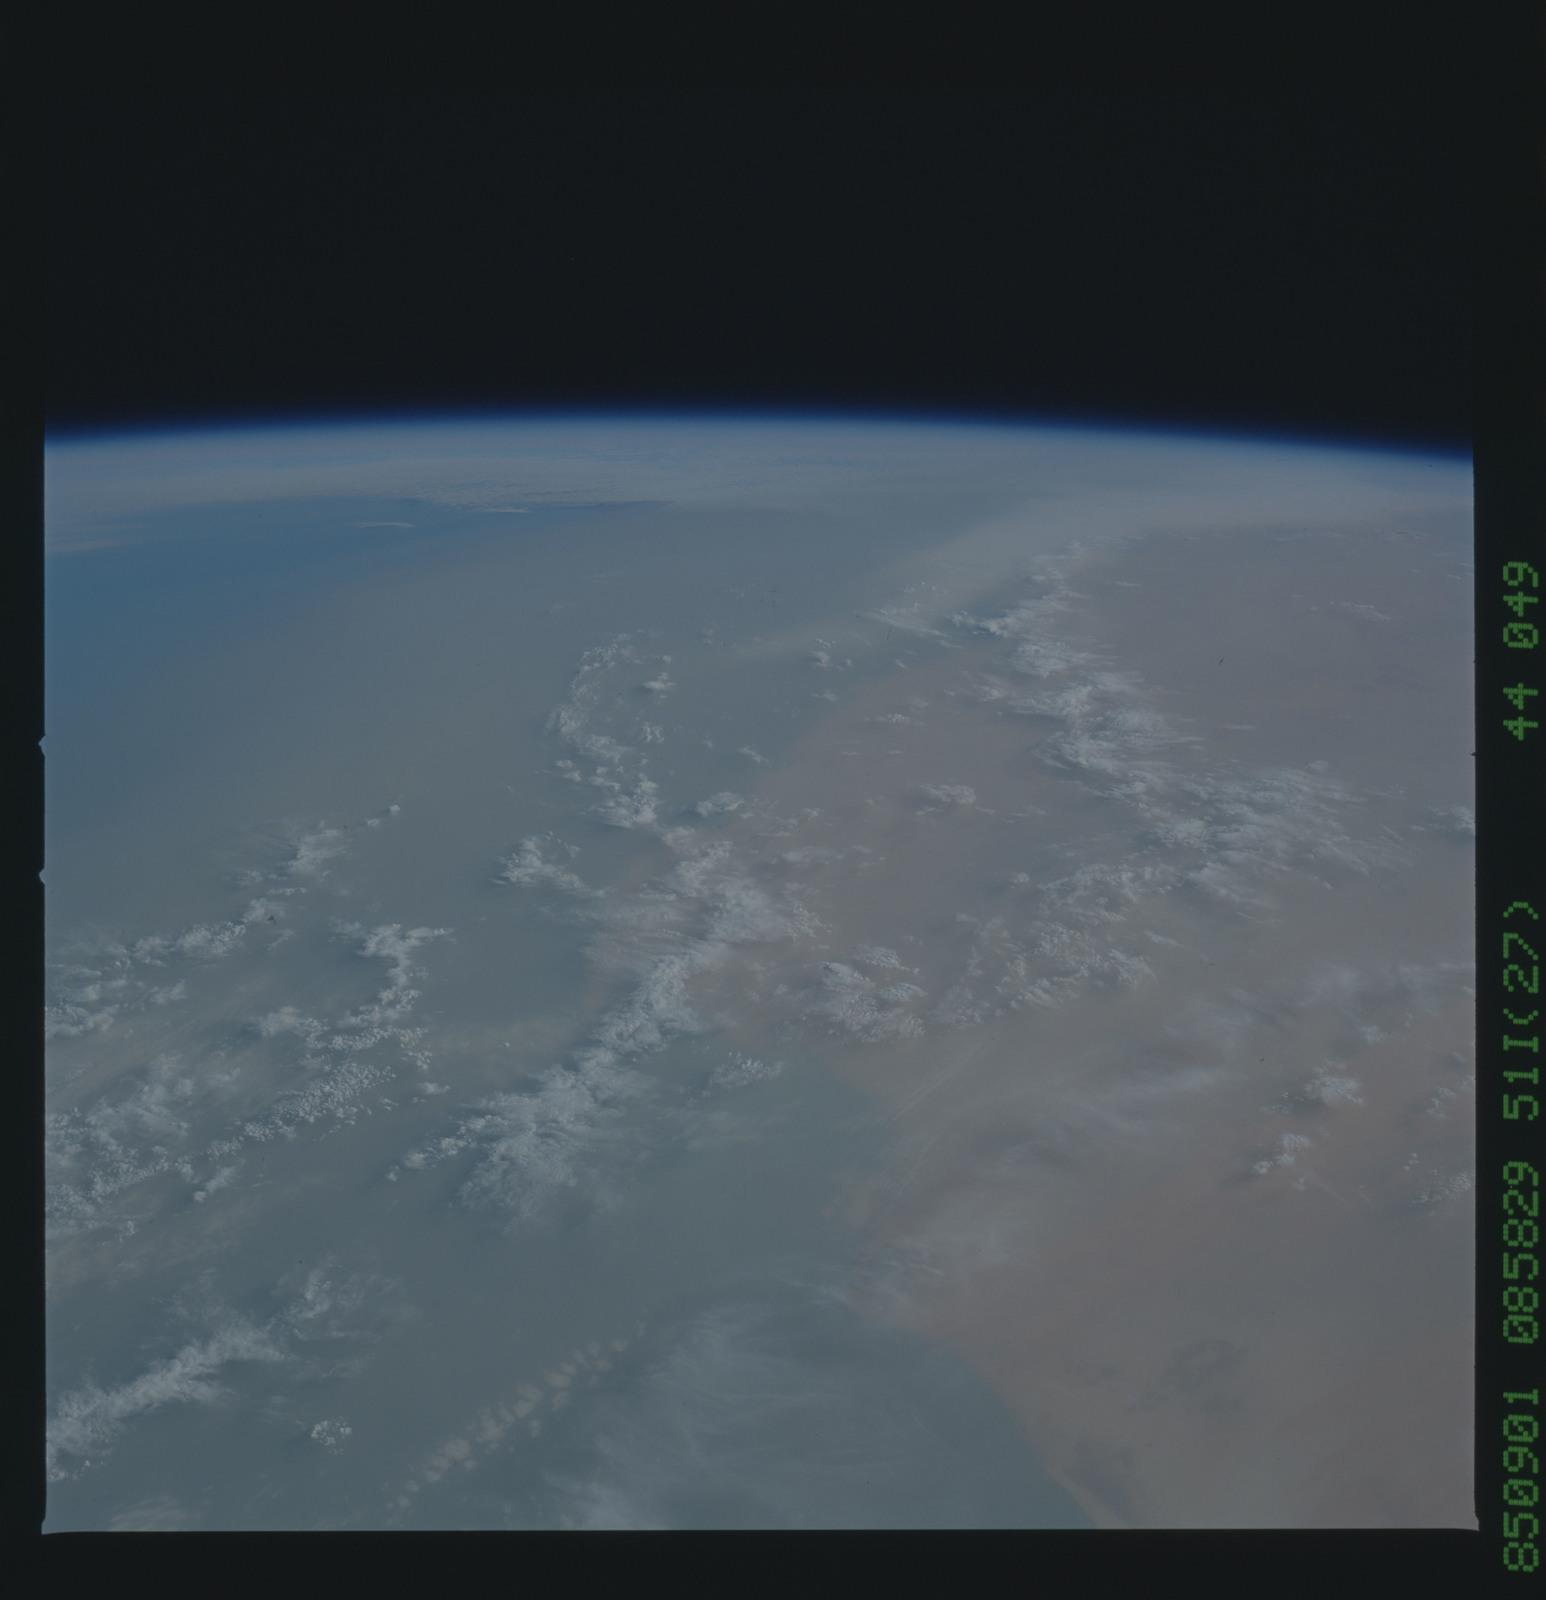 51I-44-049 - STS-51I - STS-51I earth observations